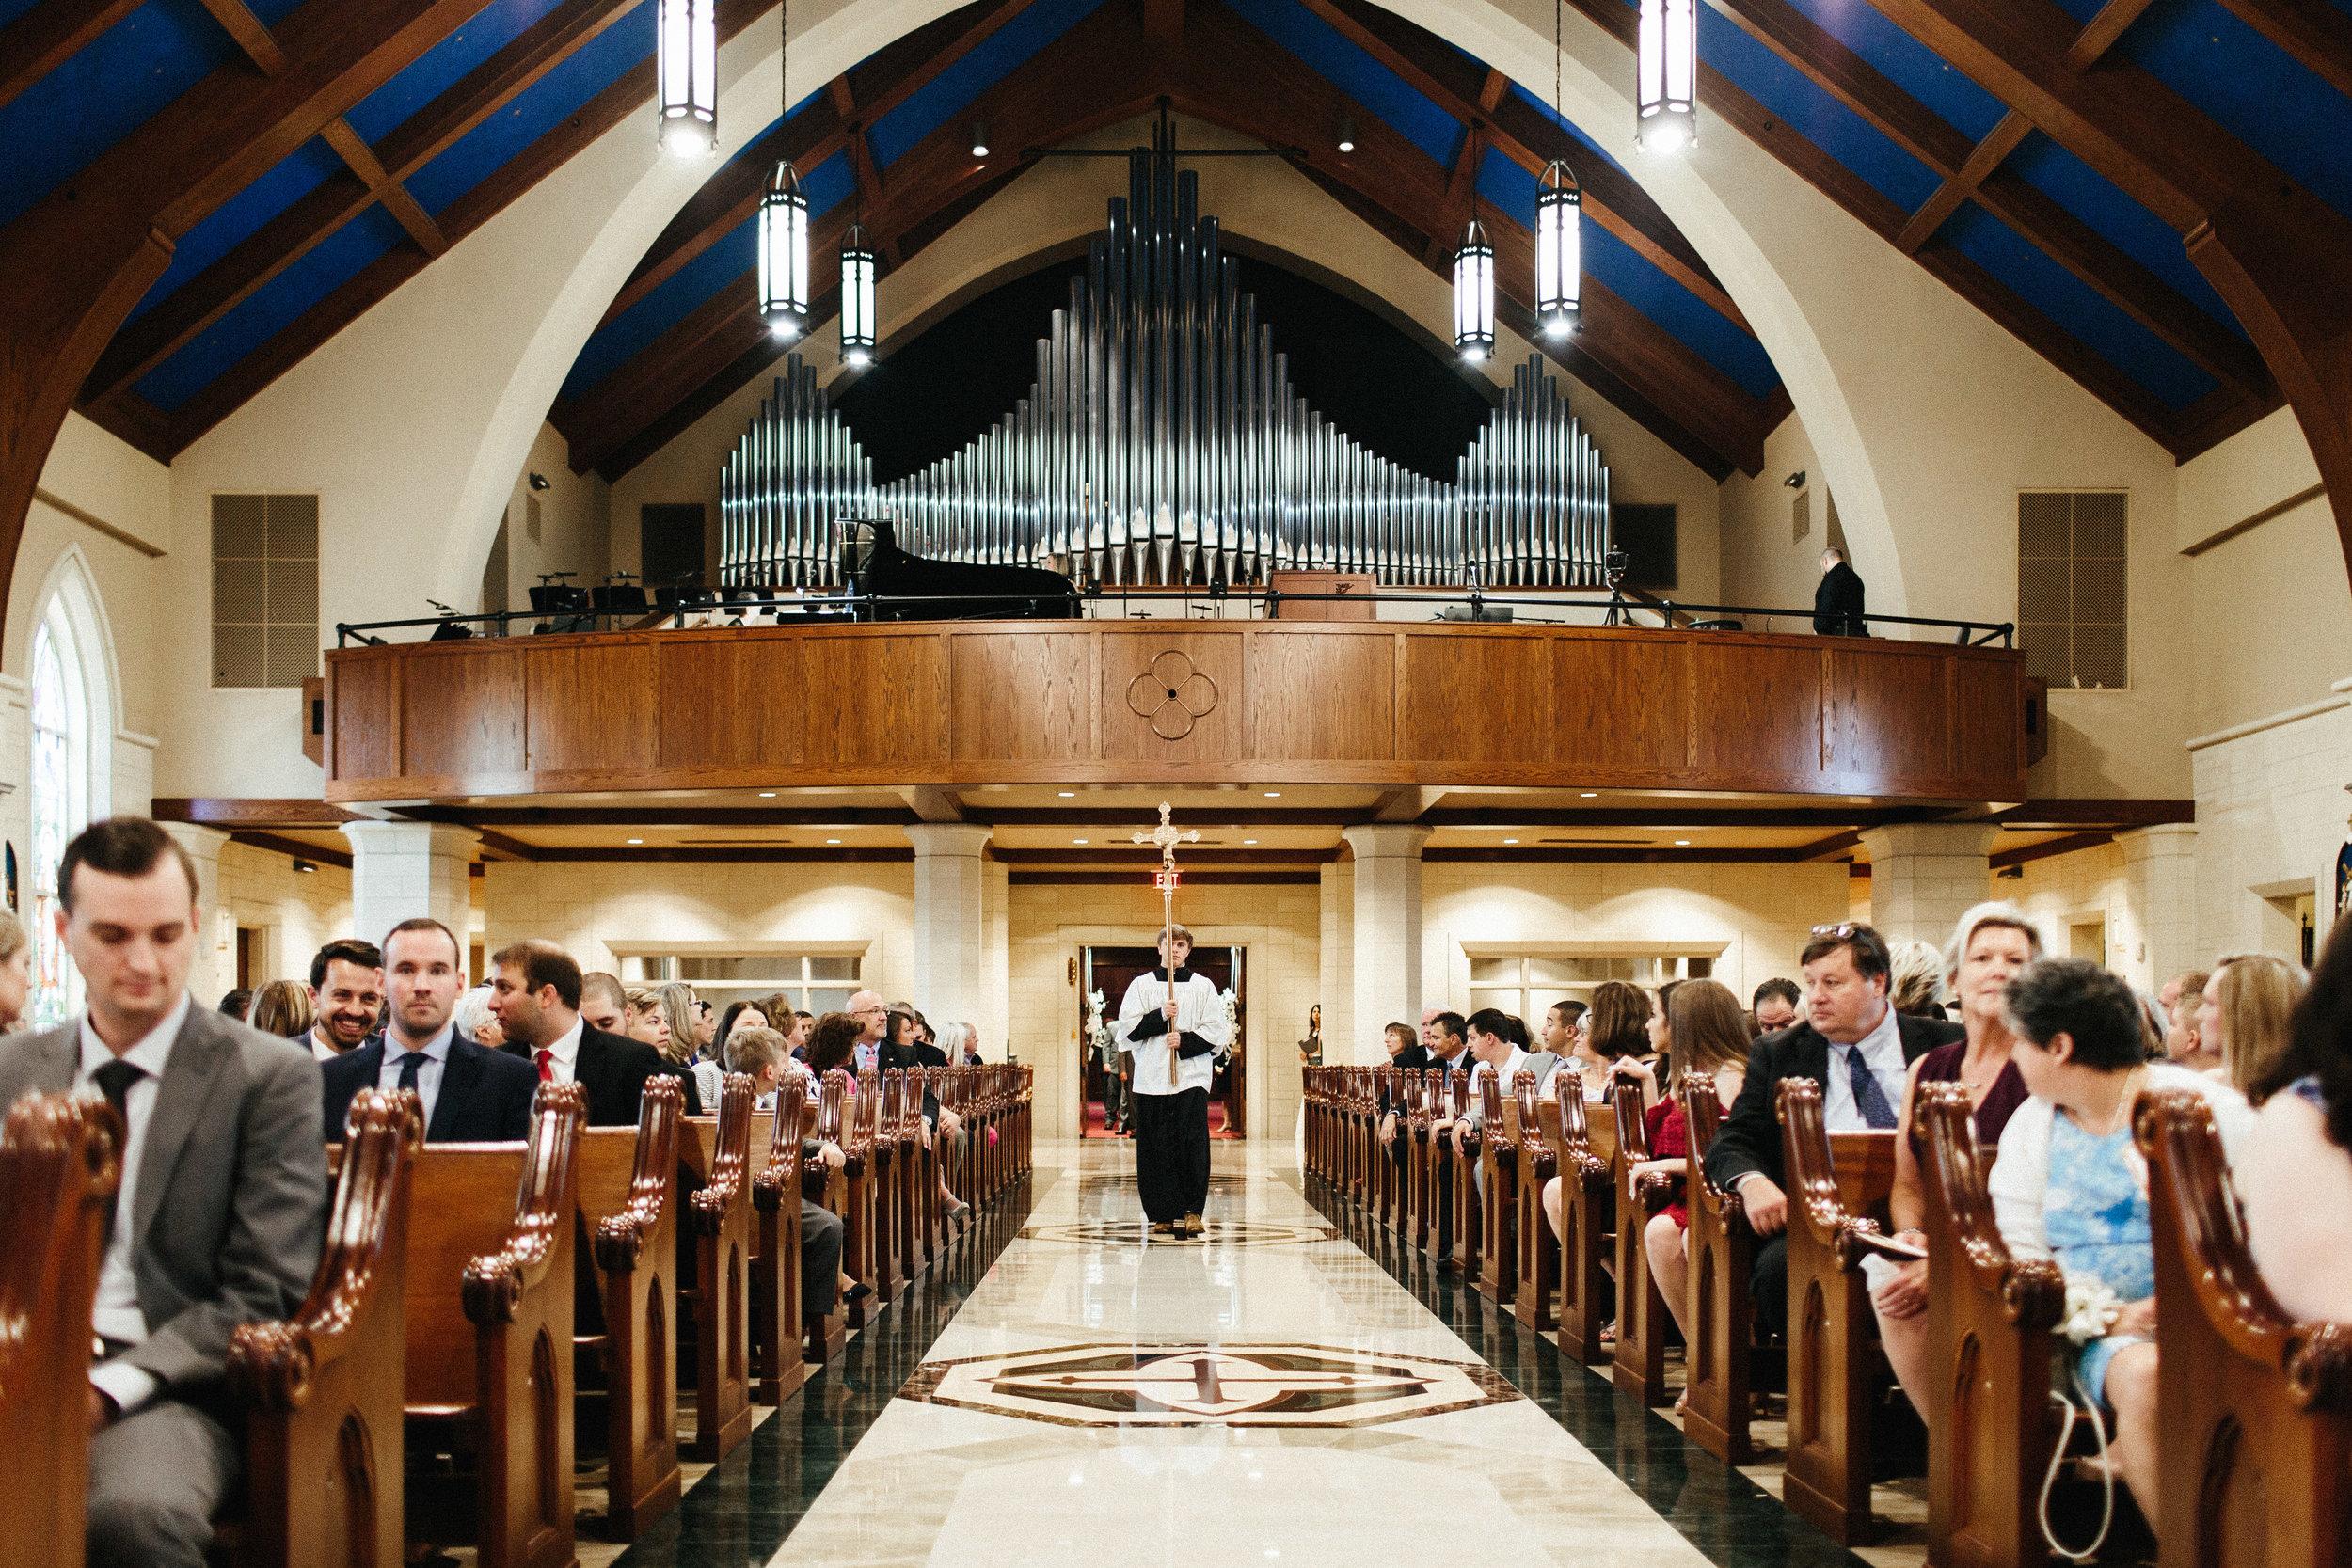 roswell_st_peter_chanel_catholic_avalon_hotel_alpharetta_wedding-1401.jpg